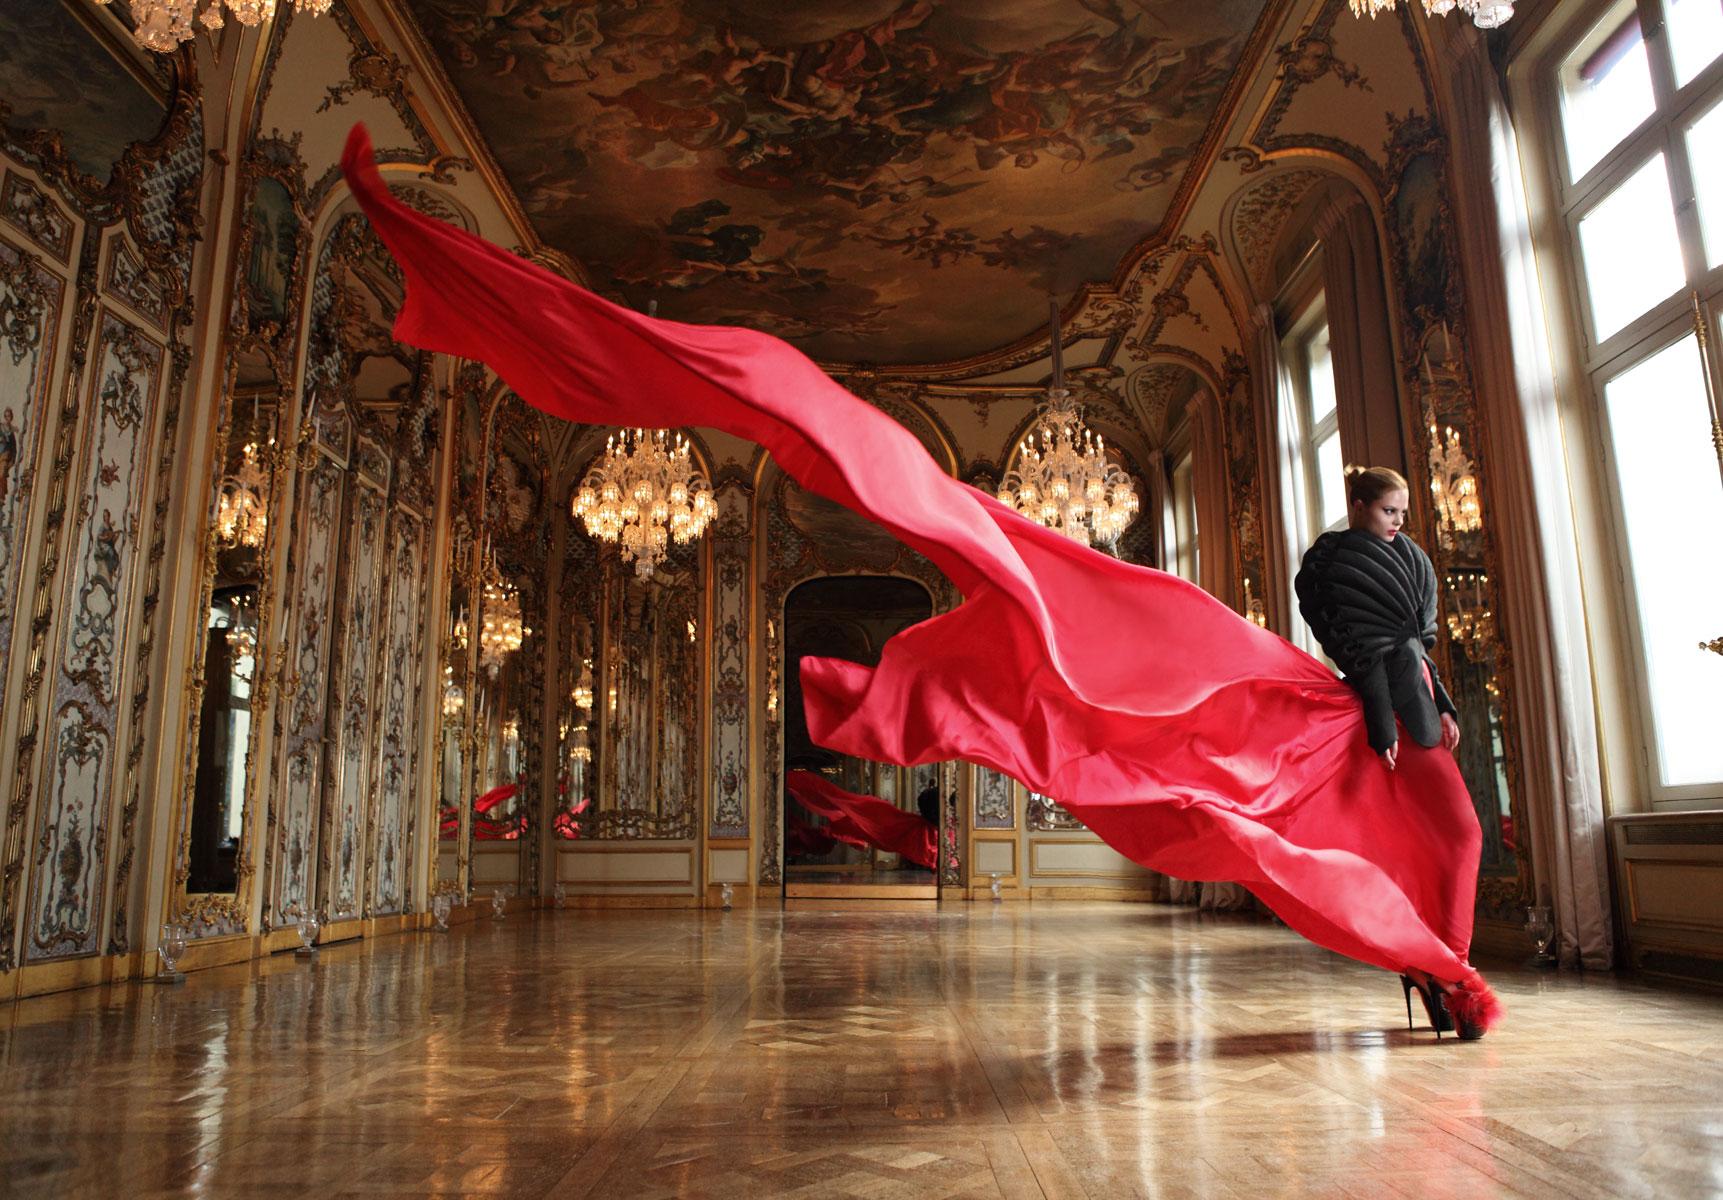 Cristalli Baccarat alla Gallerie des Glaces Versailles